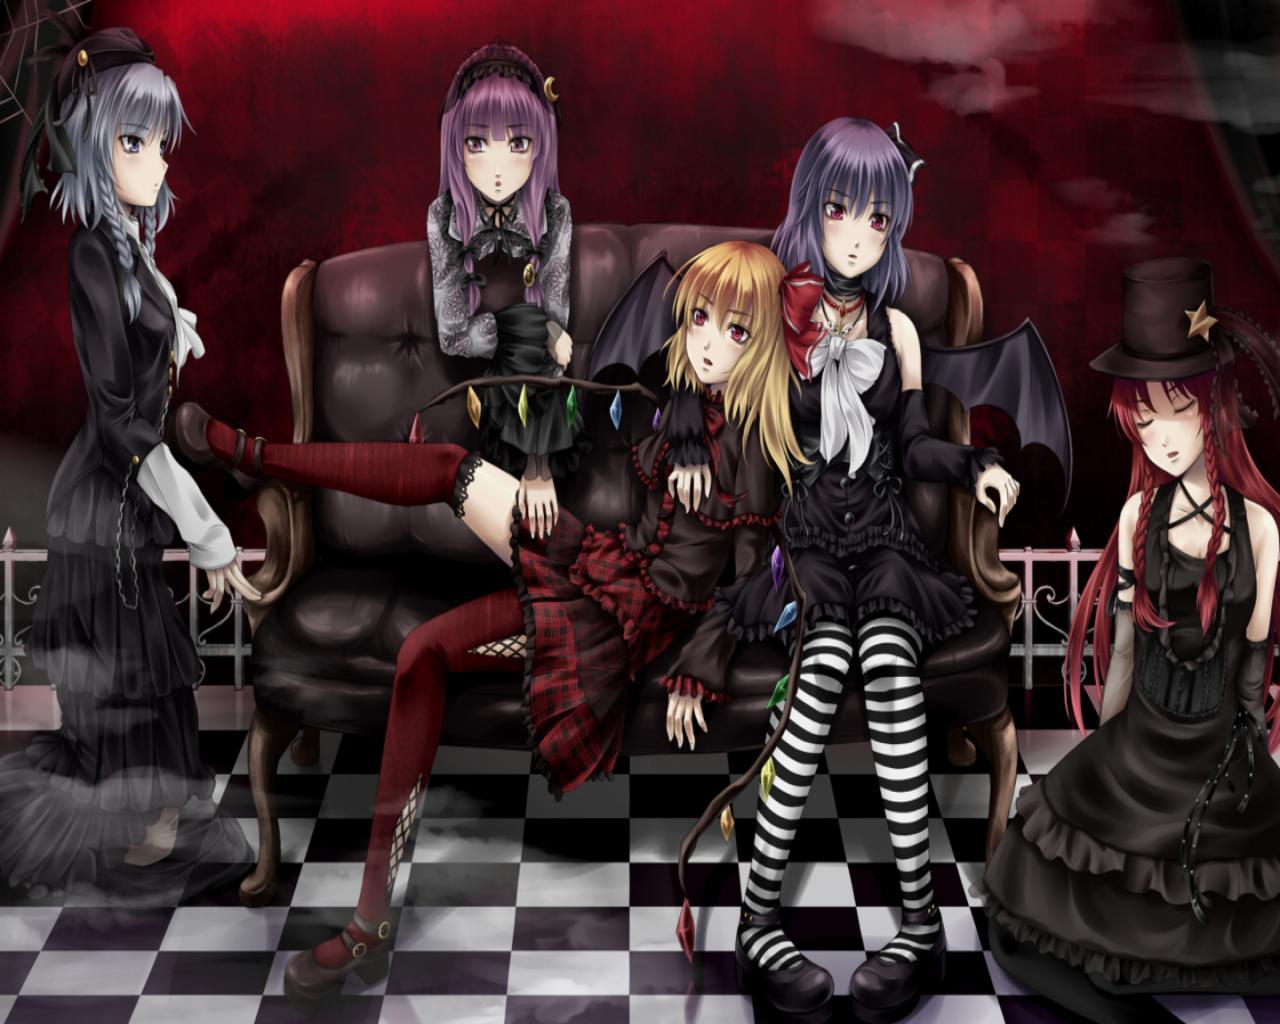 Goth anime girl